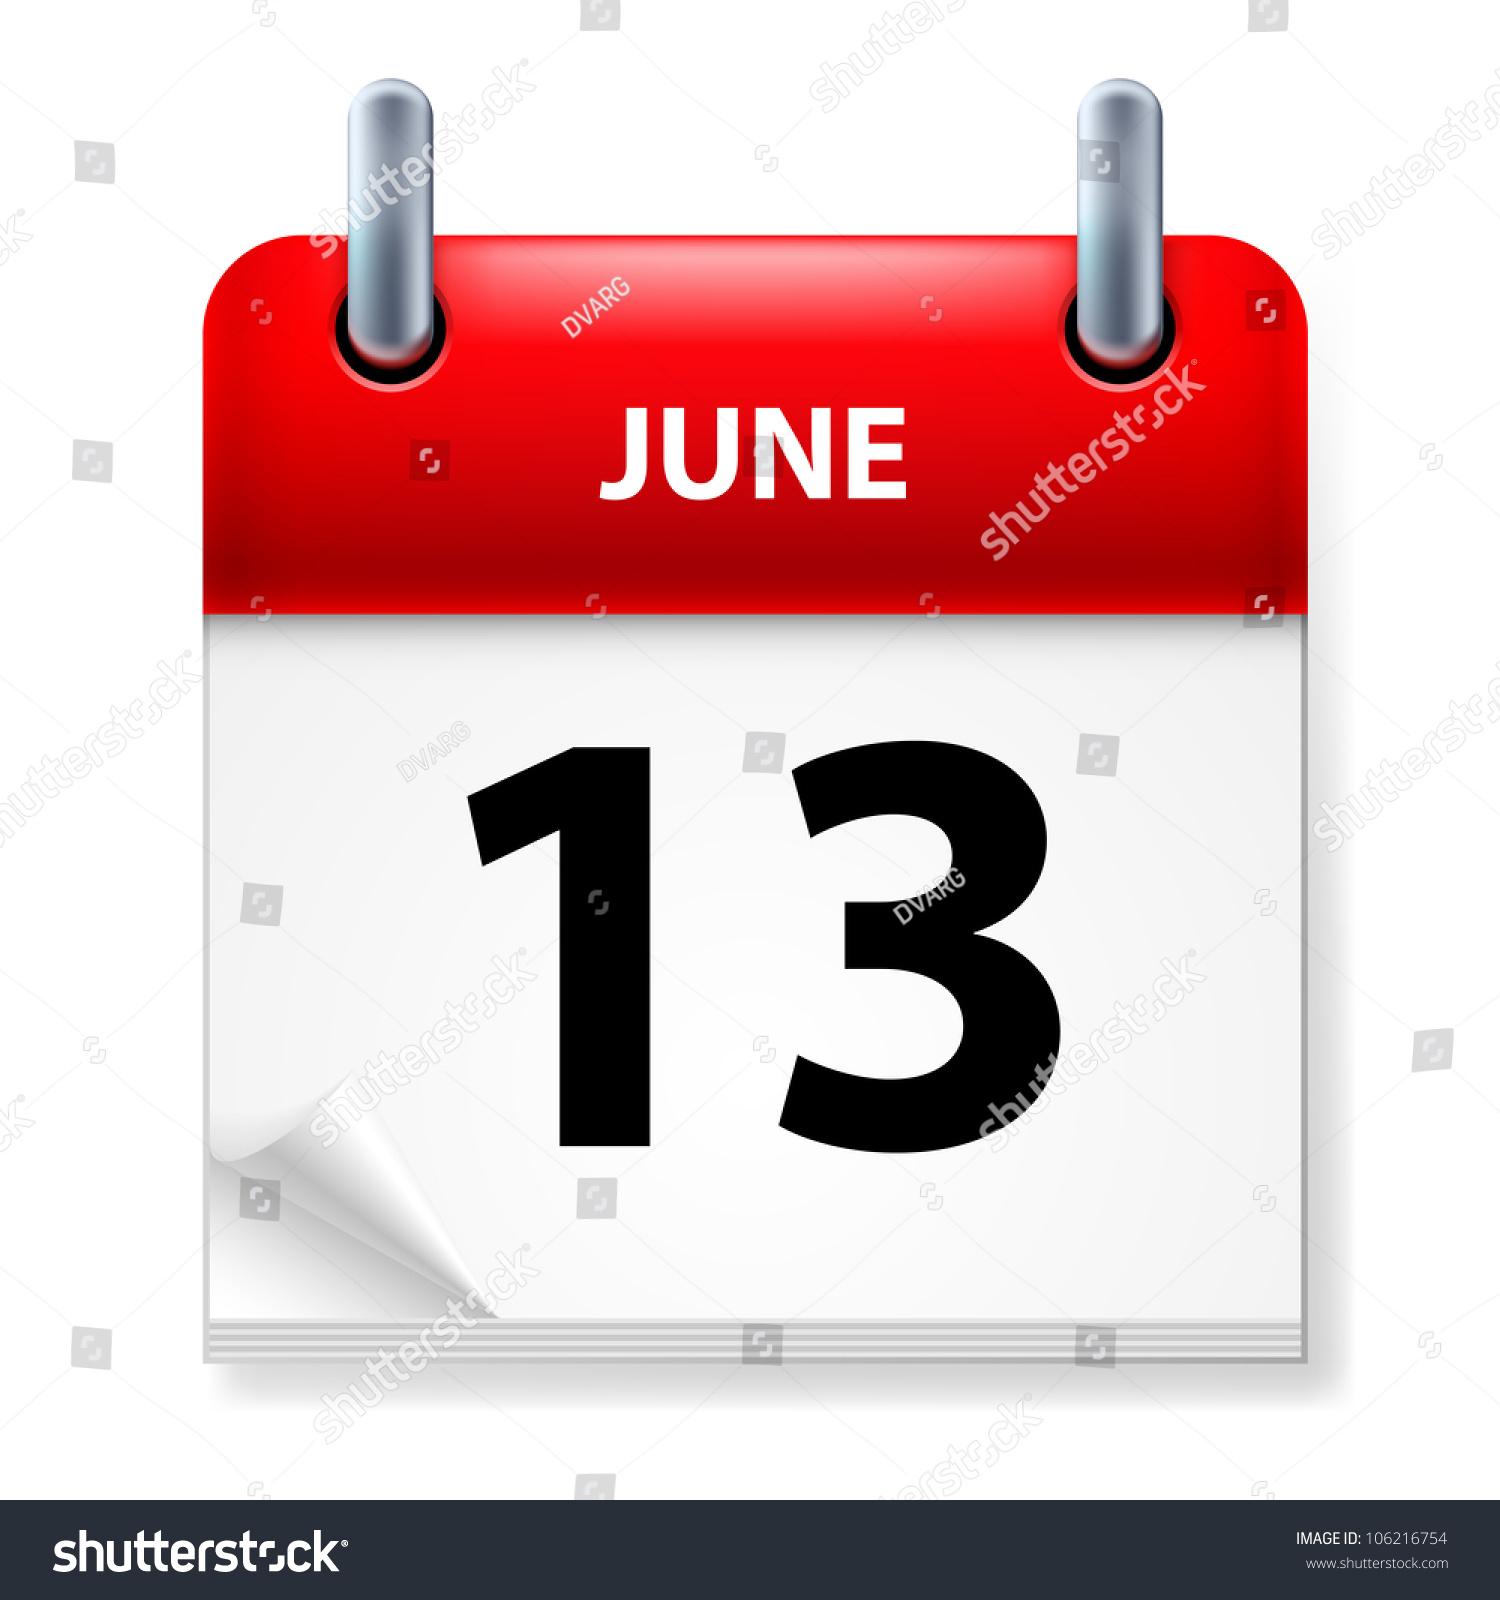 June Calendar Vector : Thirteenth june in calendar icon on white background stock